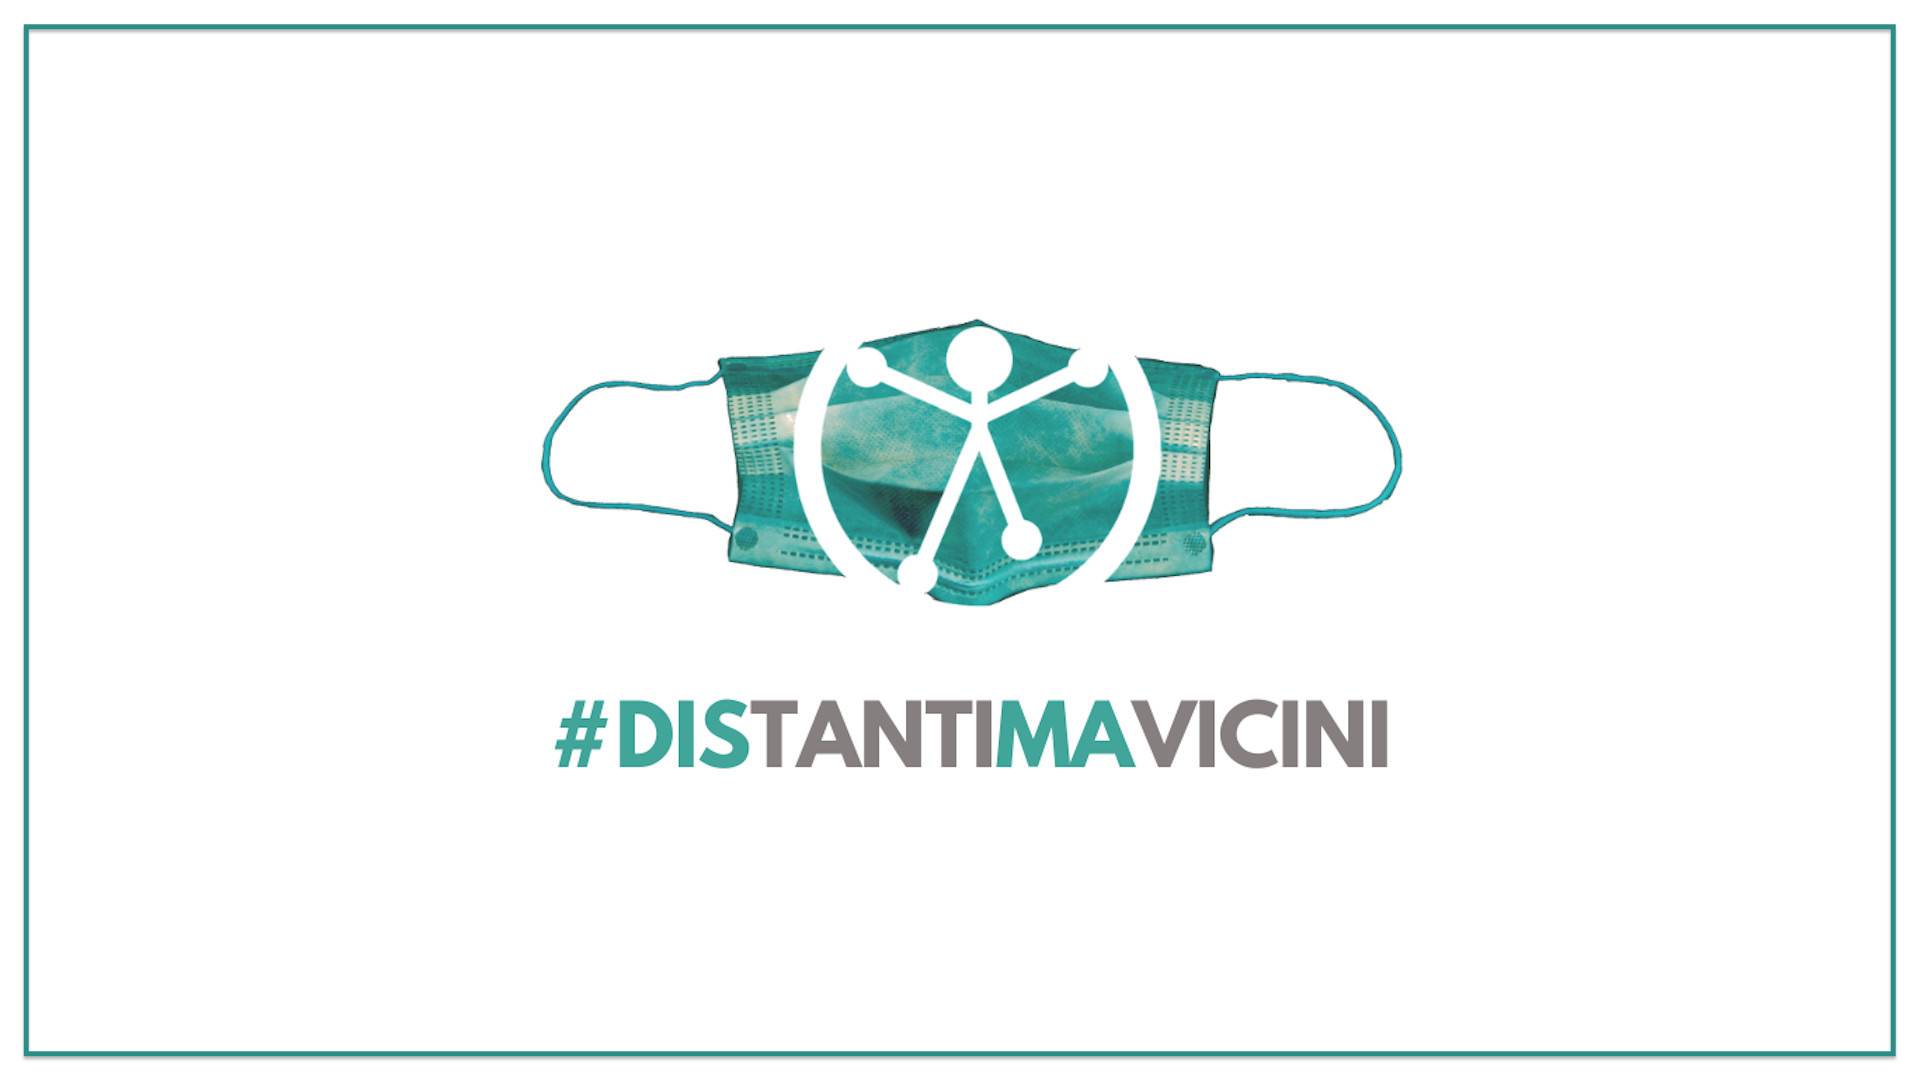 #distantimavicini